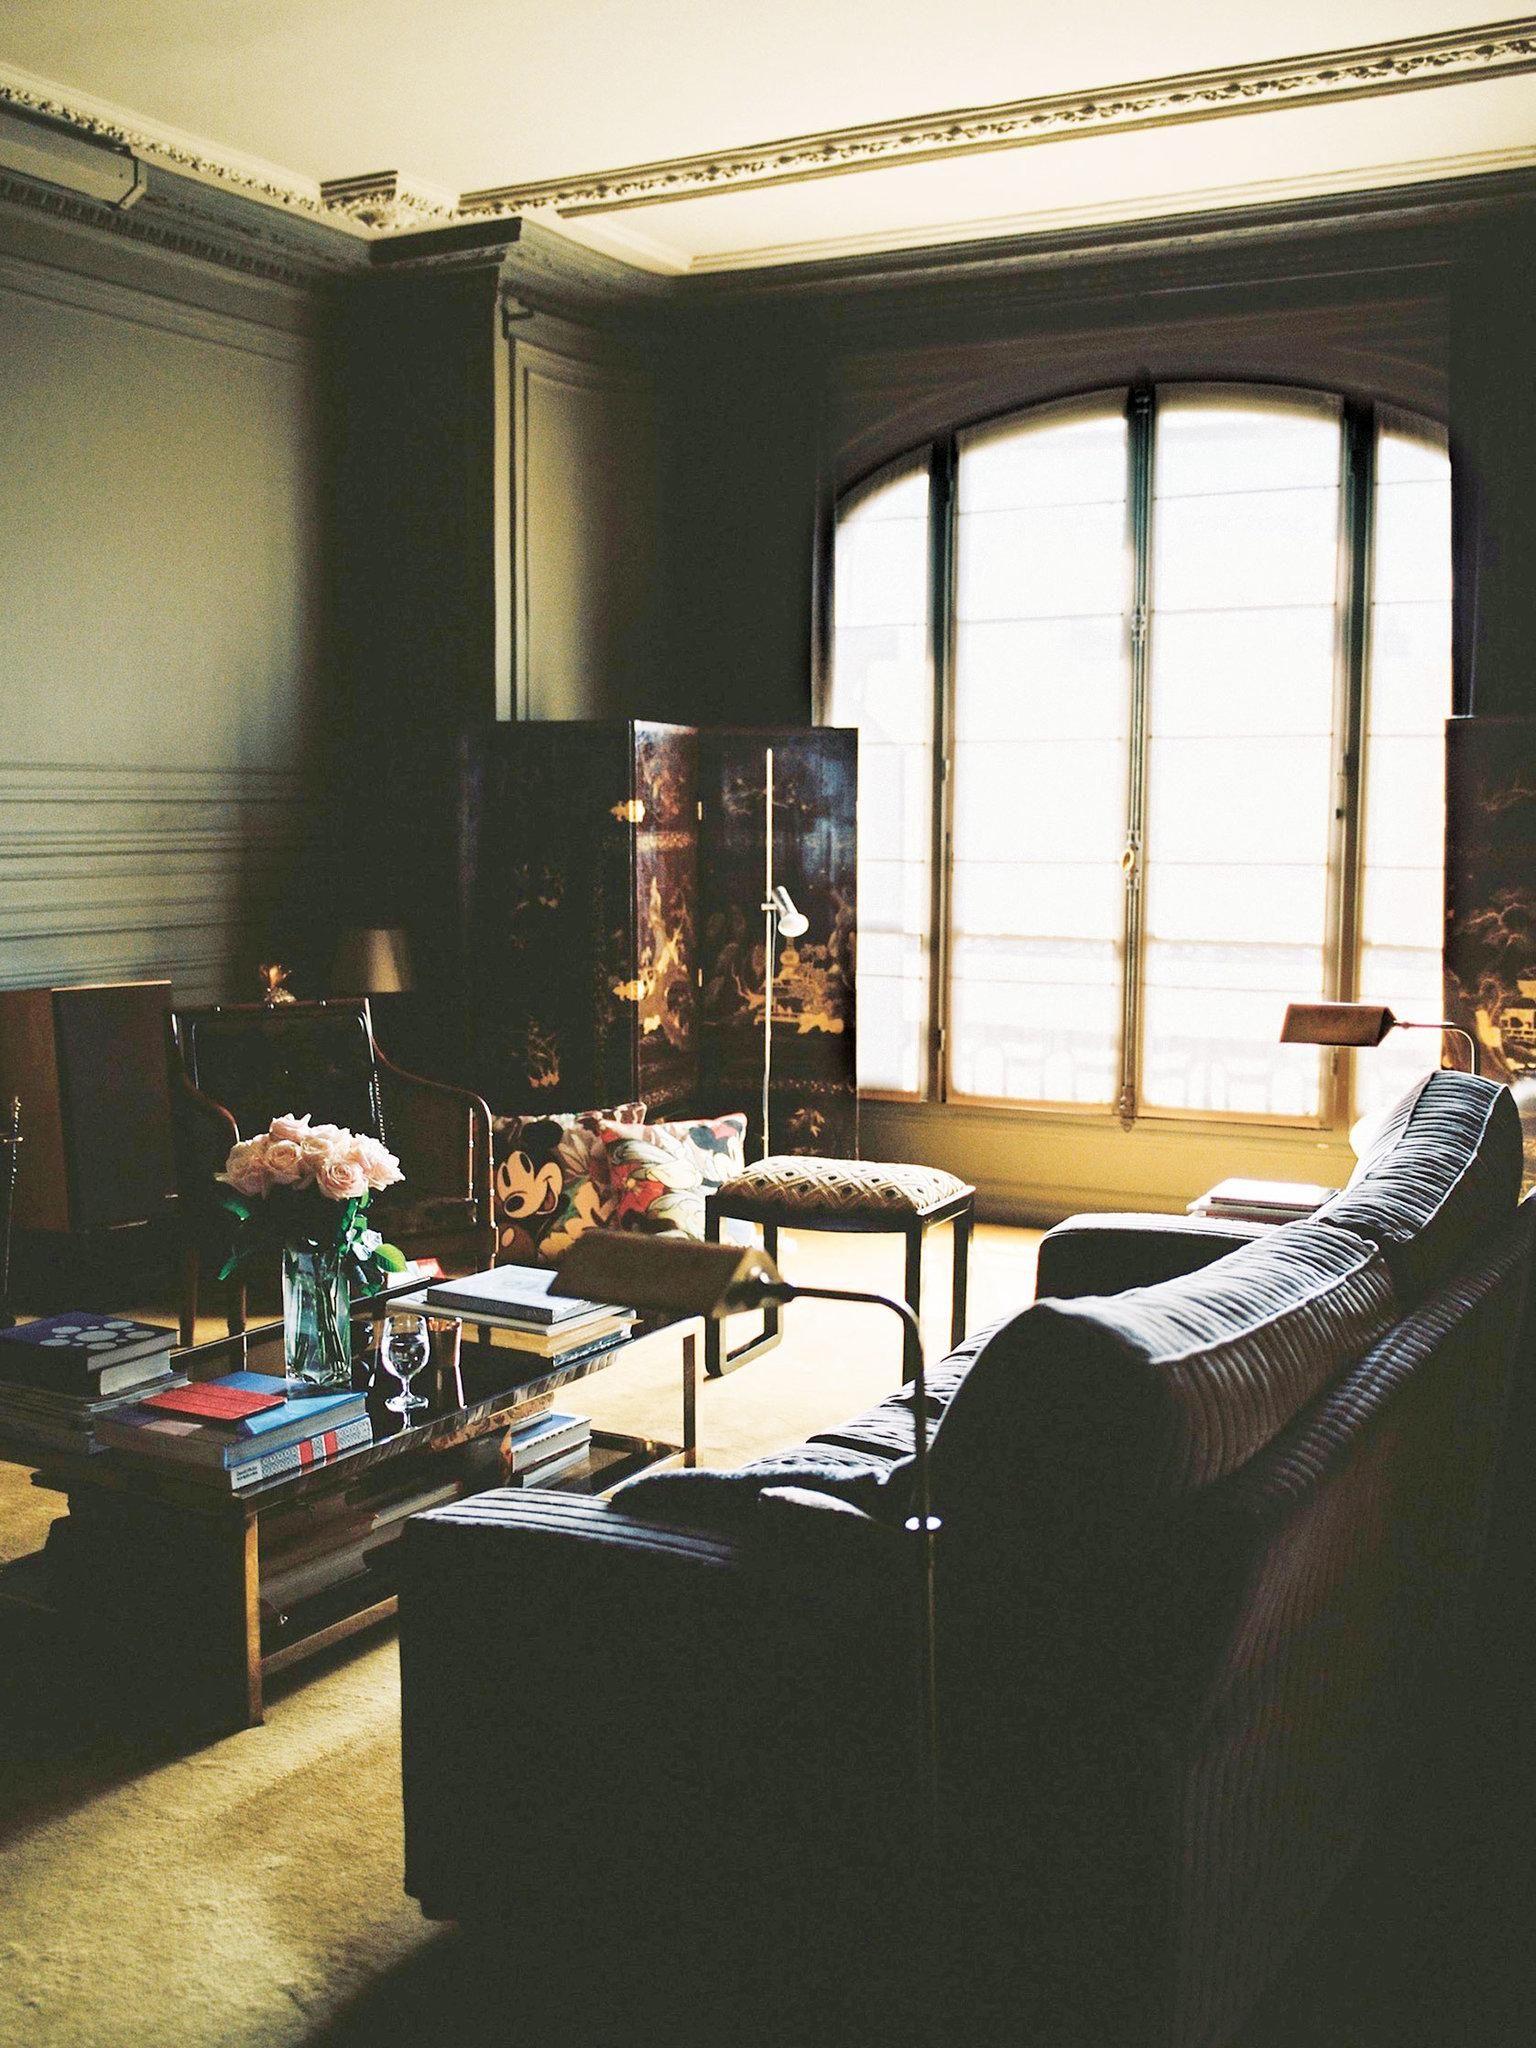 A Parisian Apartment With The Spirit Of Serge Gainsbourg Published 2018 Parisian Apartment Decor Parisian Apartment Parisian Interior The living room band